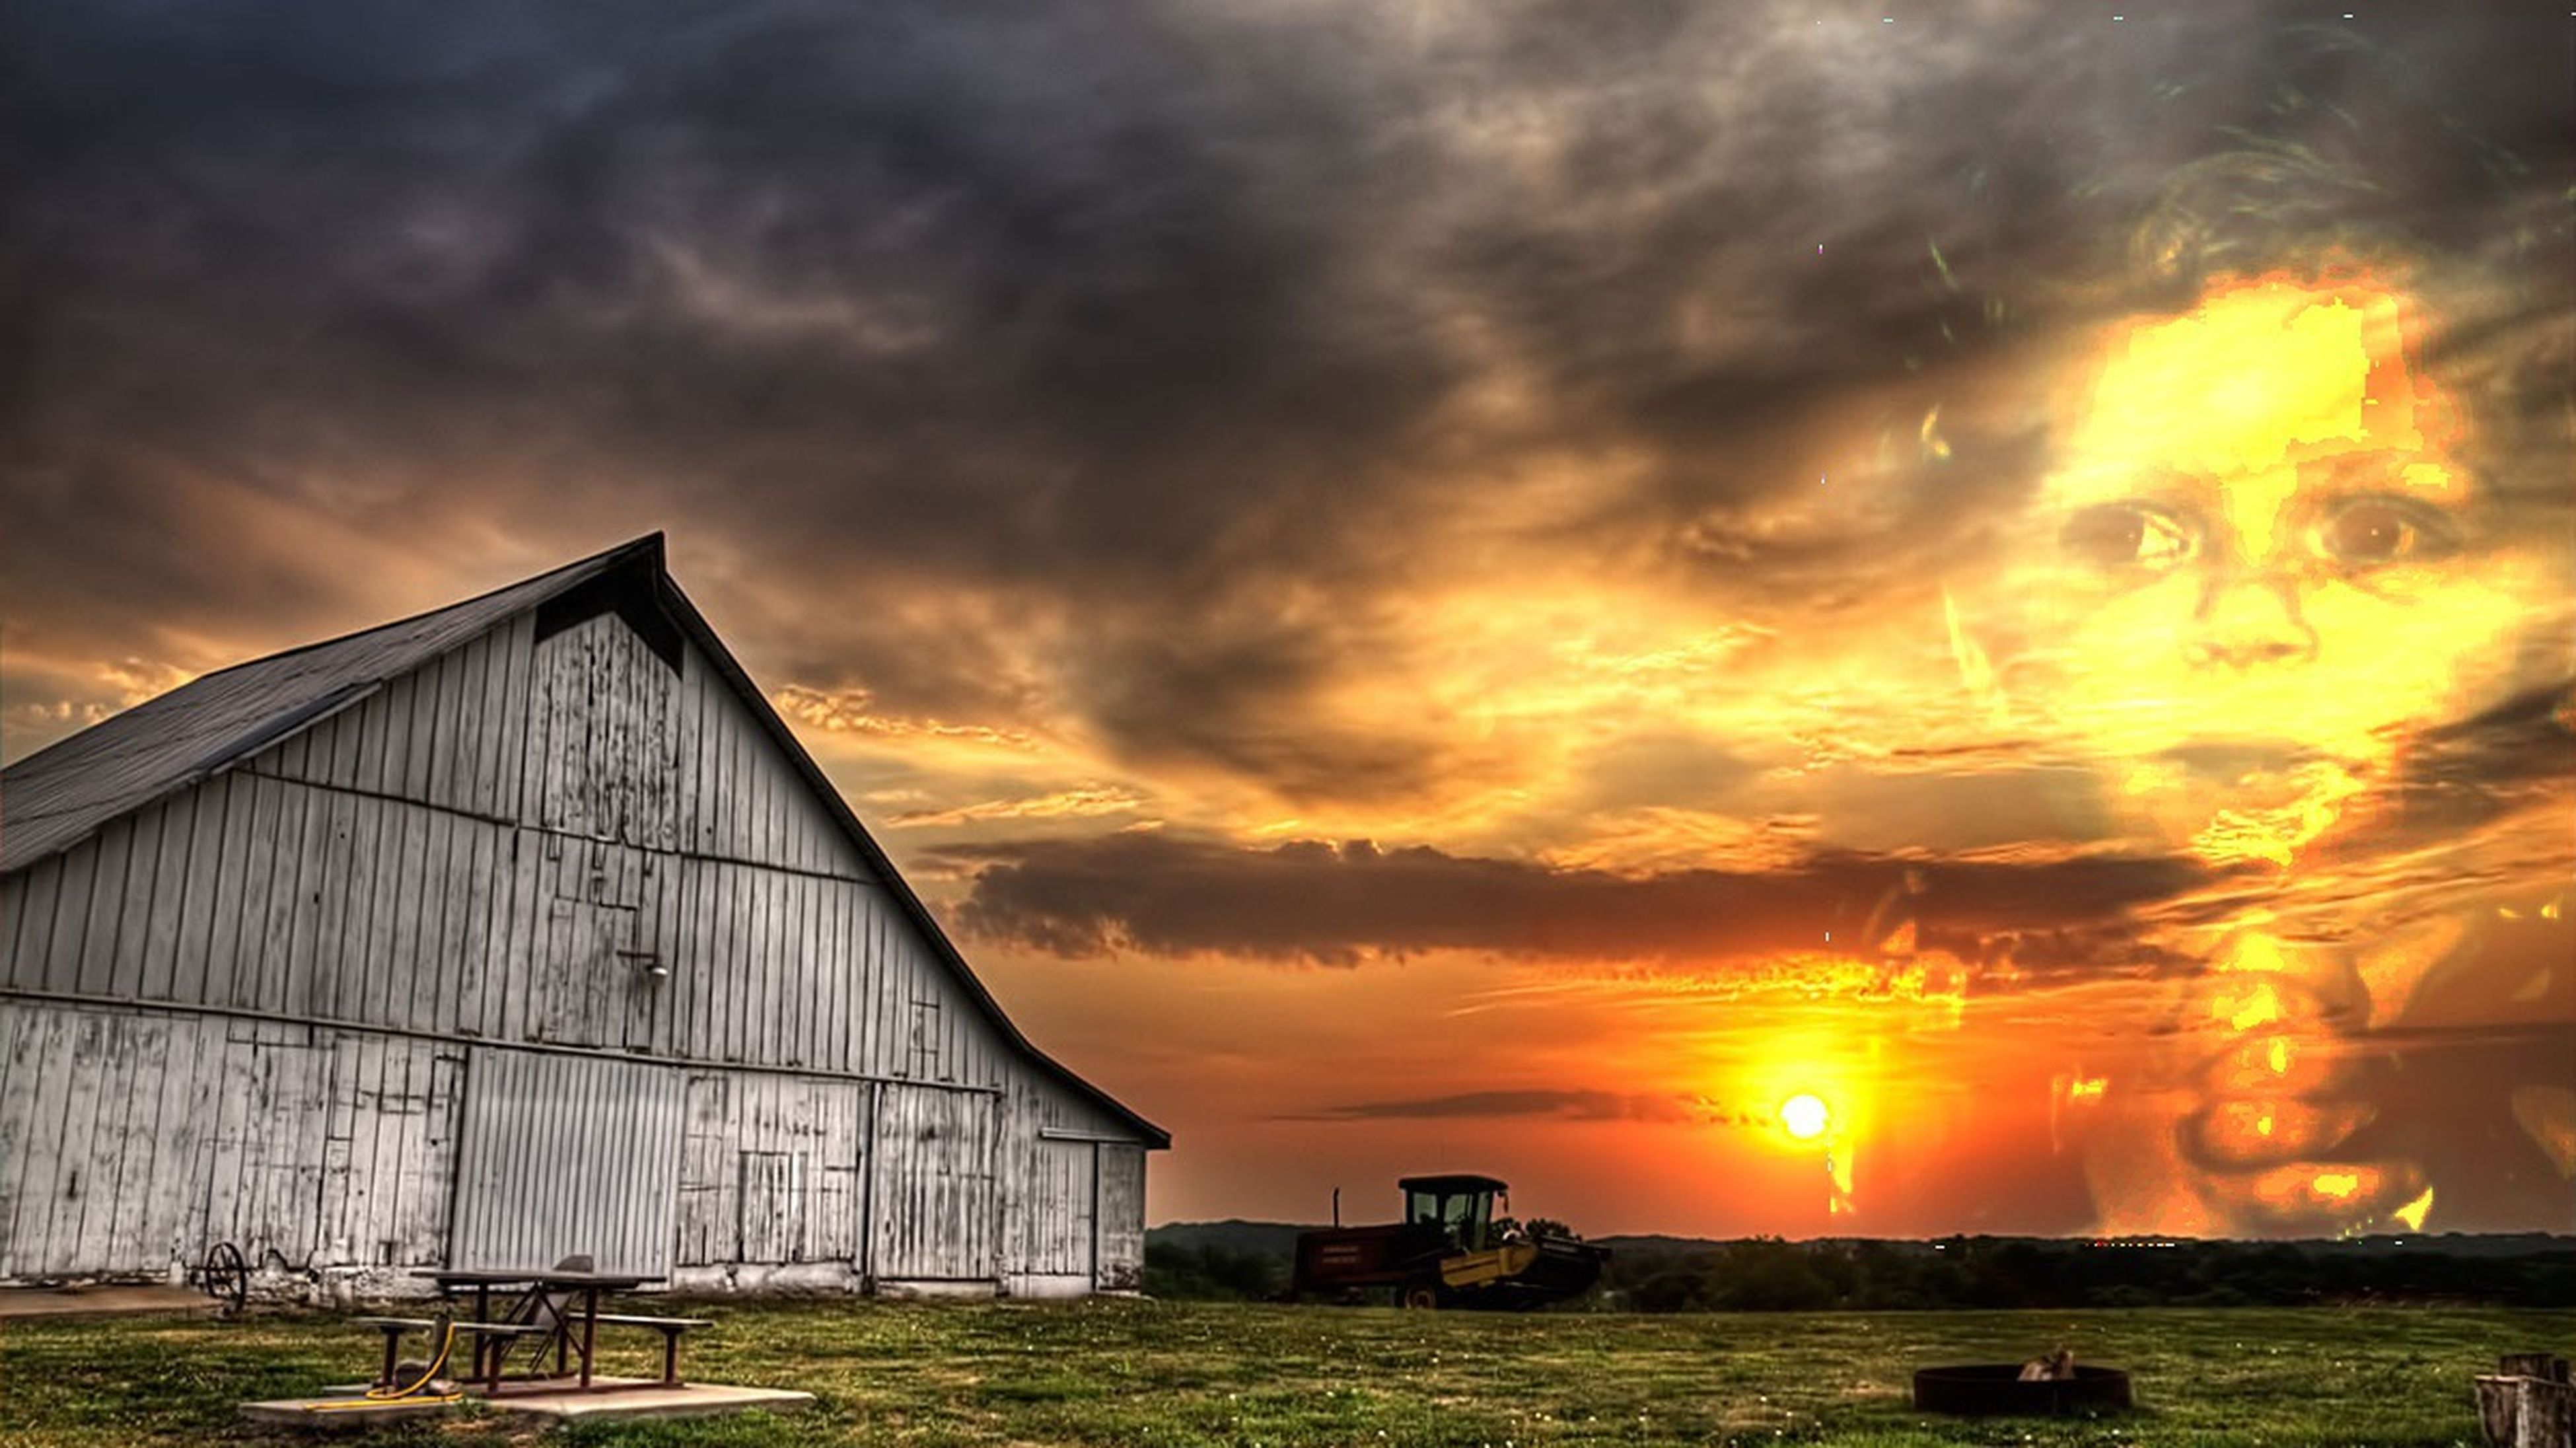 sunset, sky, cloud - sky, orange color, architecture, built structure, sun, cloudy, building exterior, dramatic sky, cloud, weather, scenics, beauty in nature, nature, sunlight, water, sunbeam, overcast, outdoors